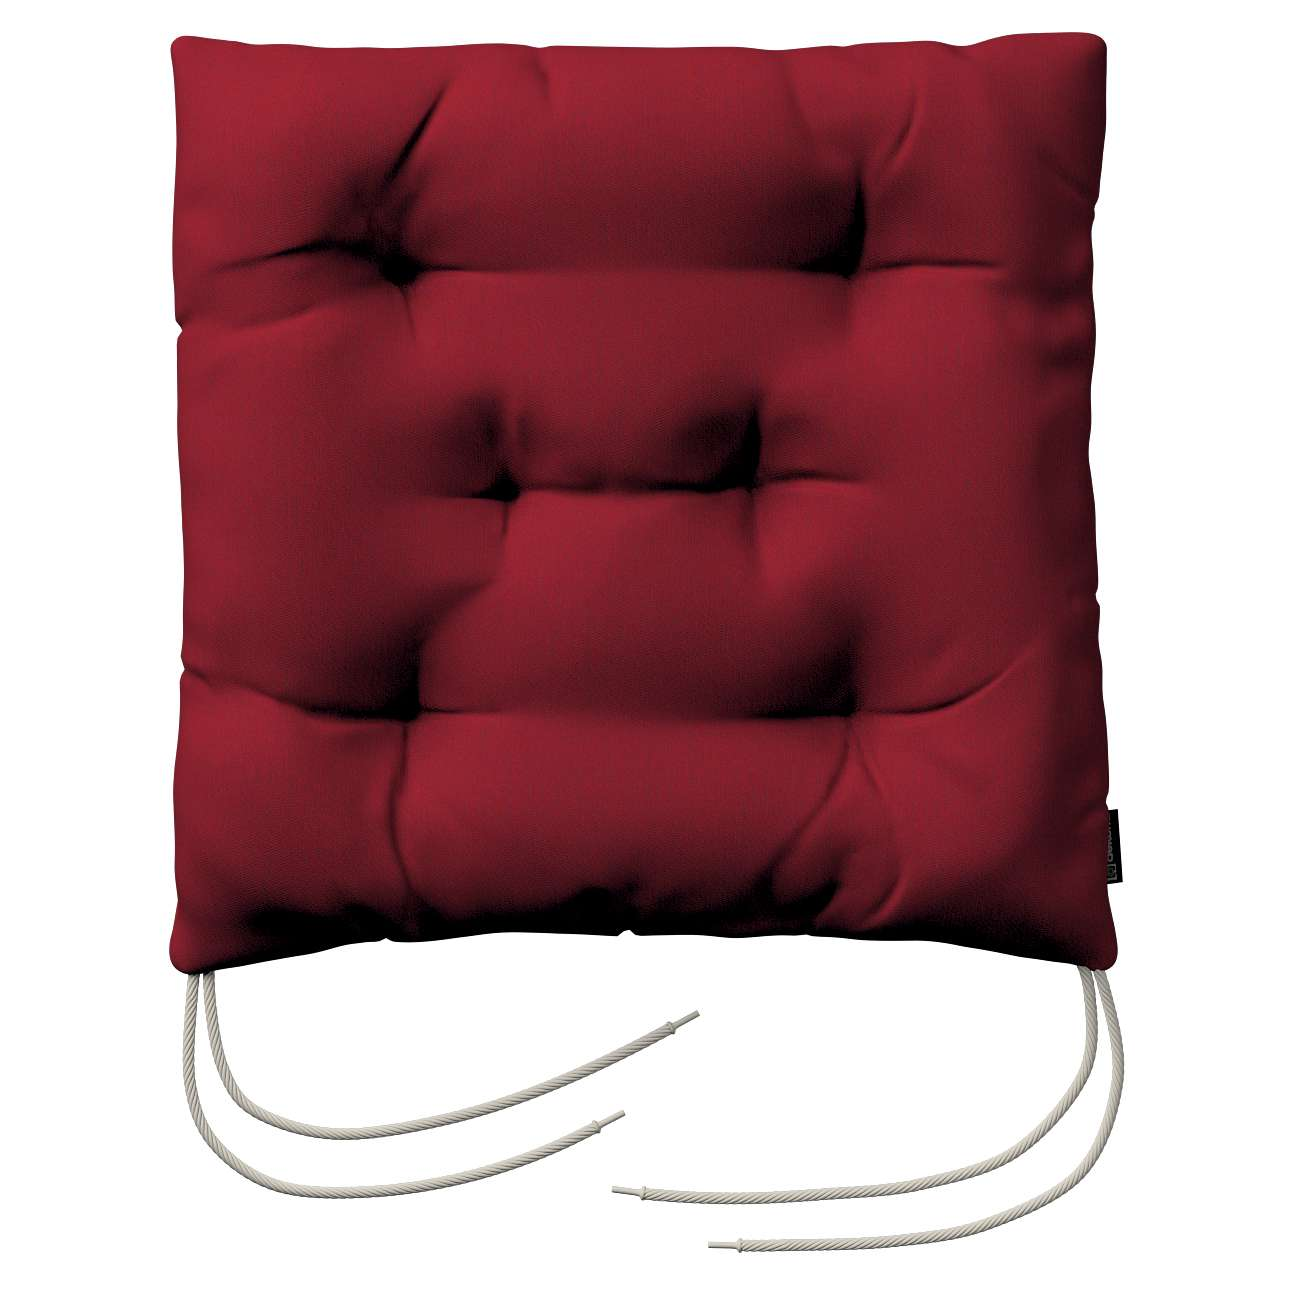 Kėdės pagalvėlė Jacek  40 x 40 x 8 cm kolekcijoje Chenille, audinys: 702-24